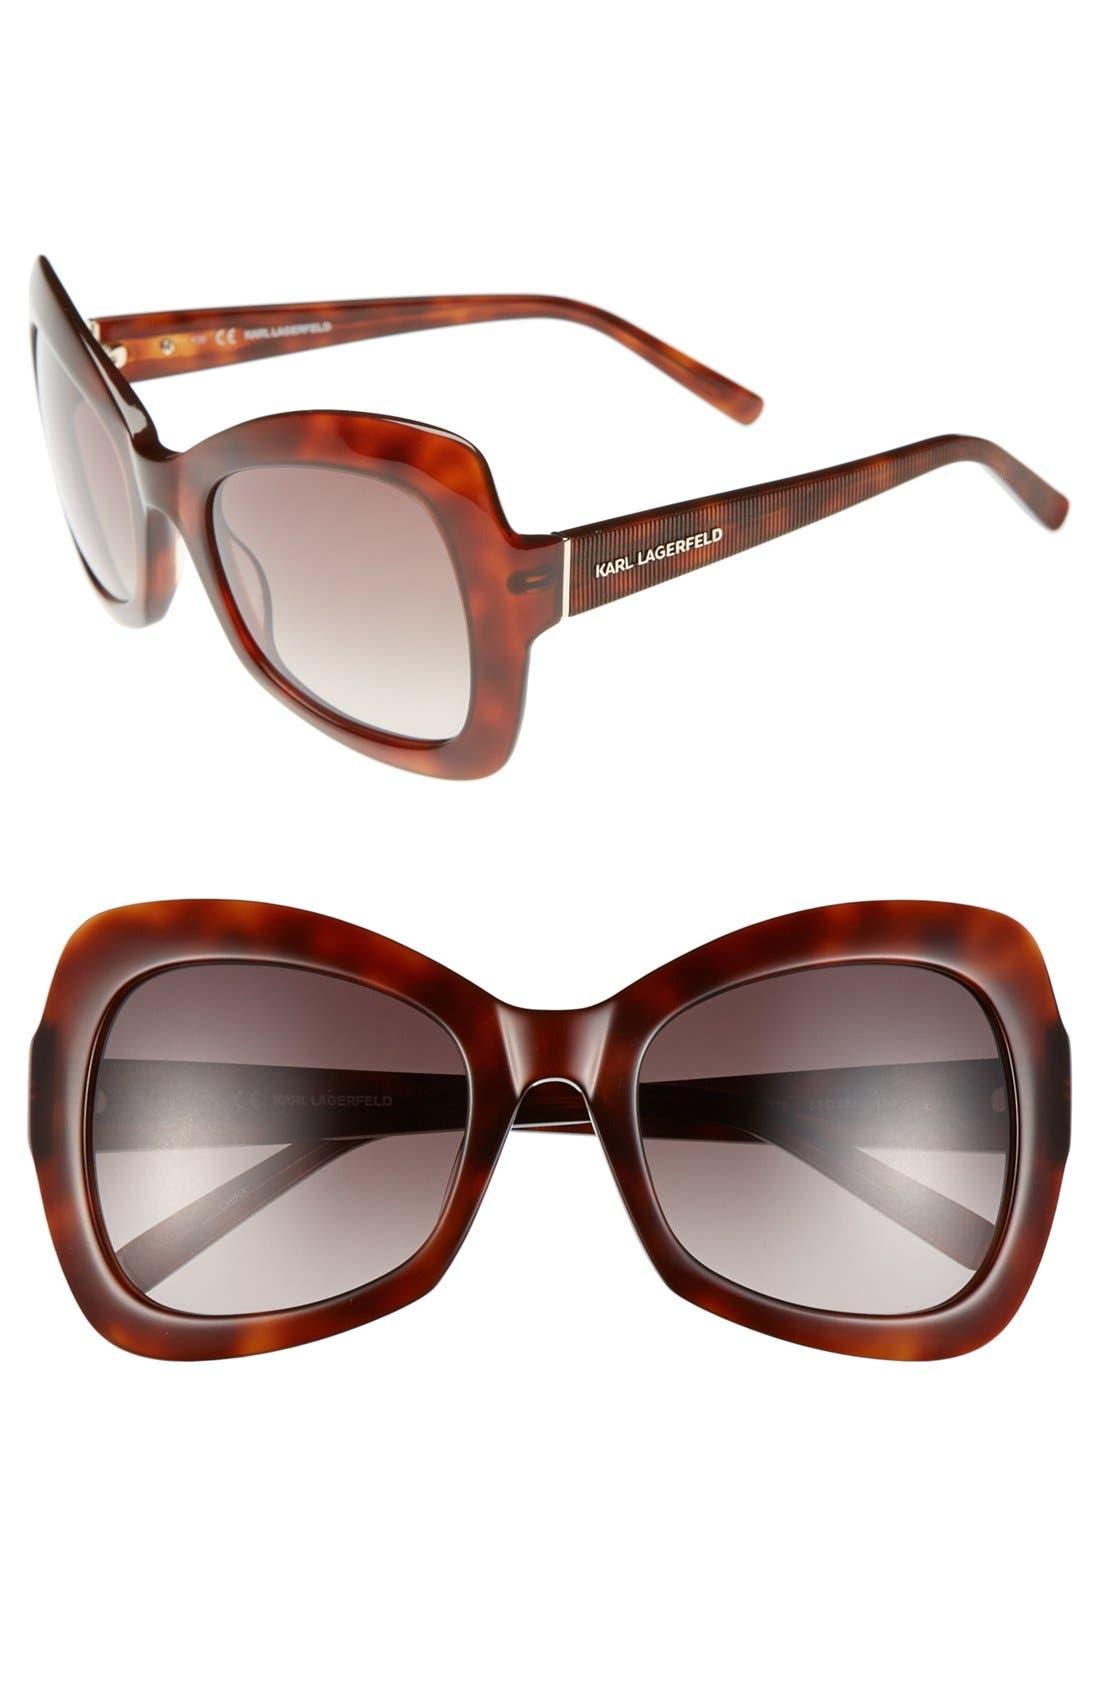 Main Image - Karl Lagerfeld 53mm Oversized Butterfly Sunglasses